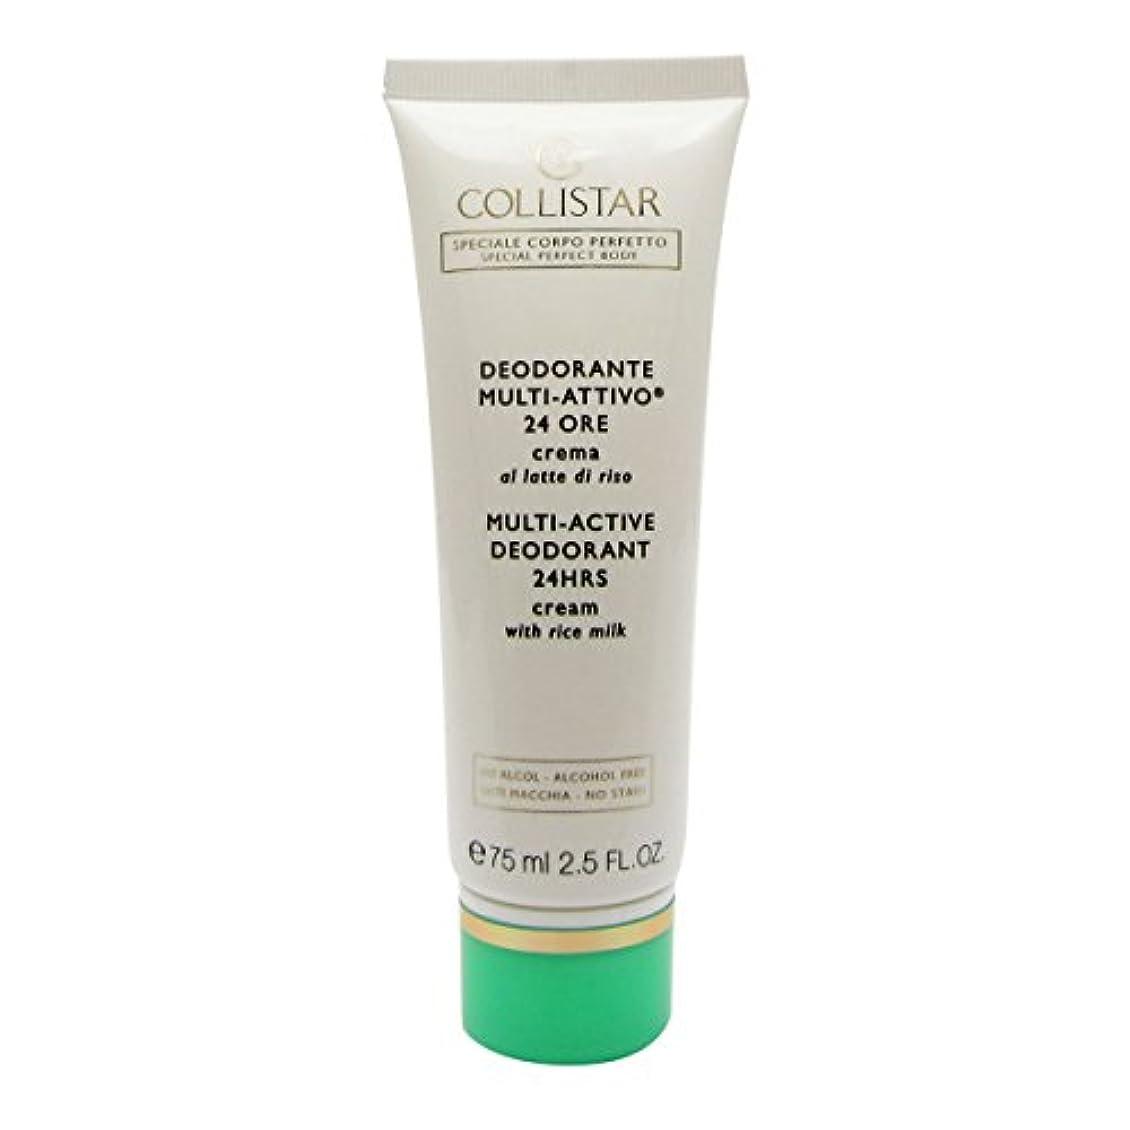 宿泊施設創傷責Collistar Multi Active Deodorant Cream 75ml [並行輸入品]